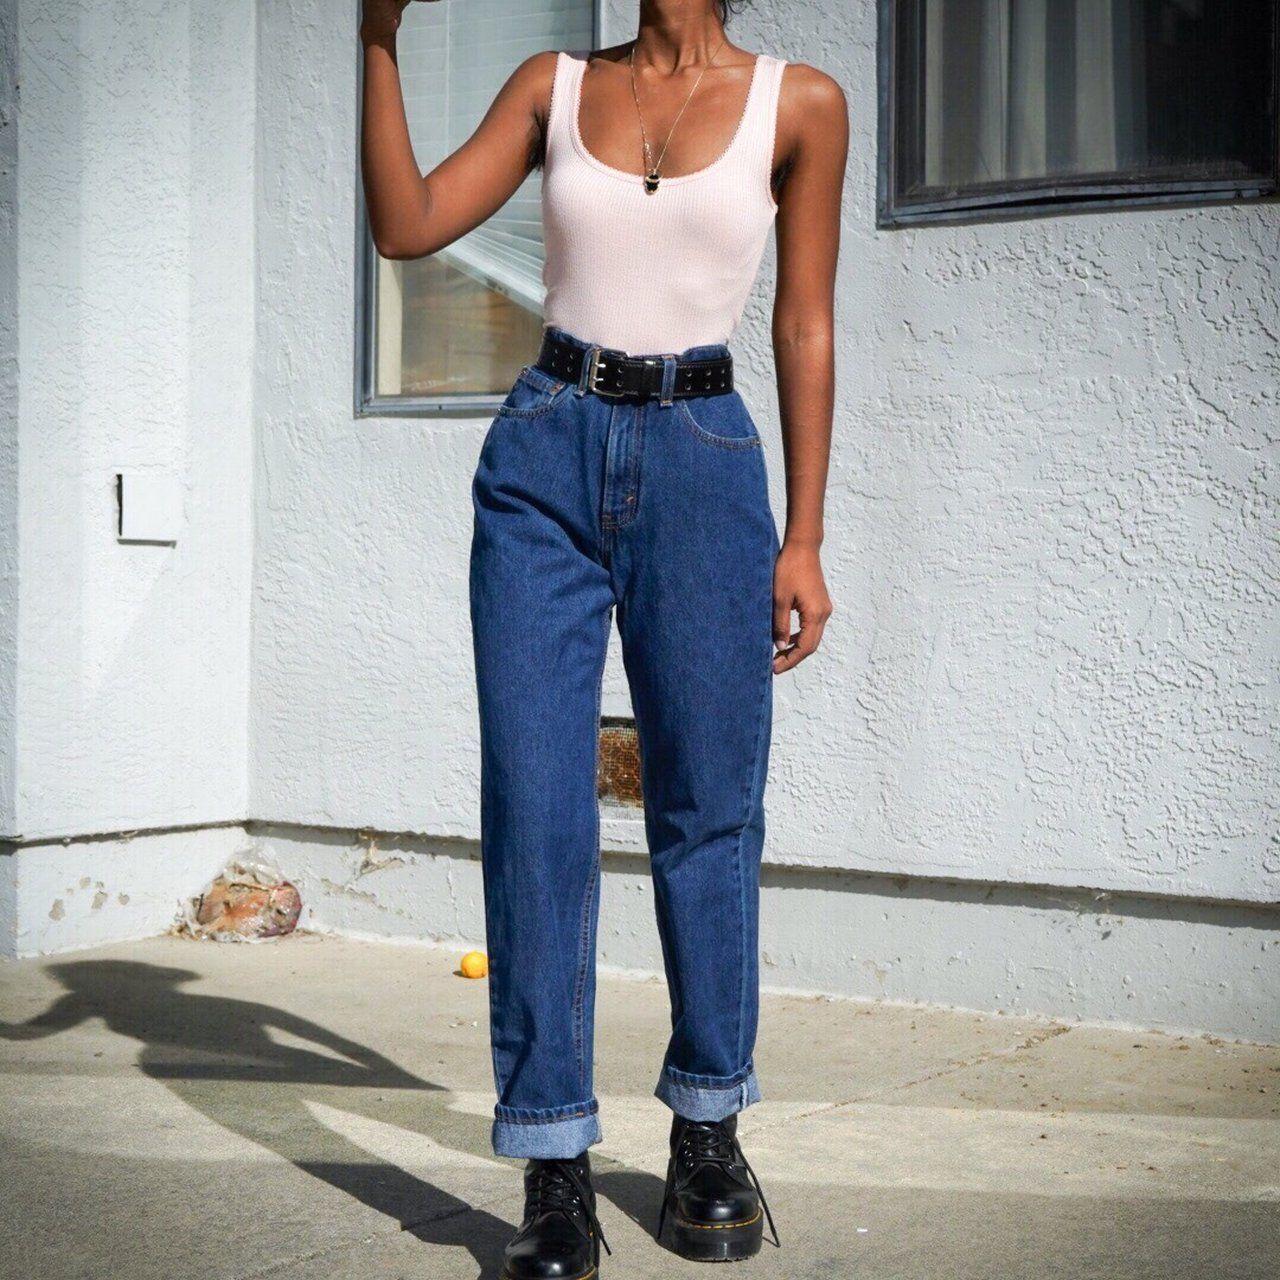 Bundle Mom Jeans Outfit 90s Fashion Outfits 90s Fashion